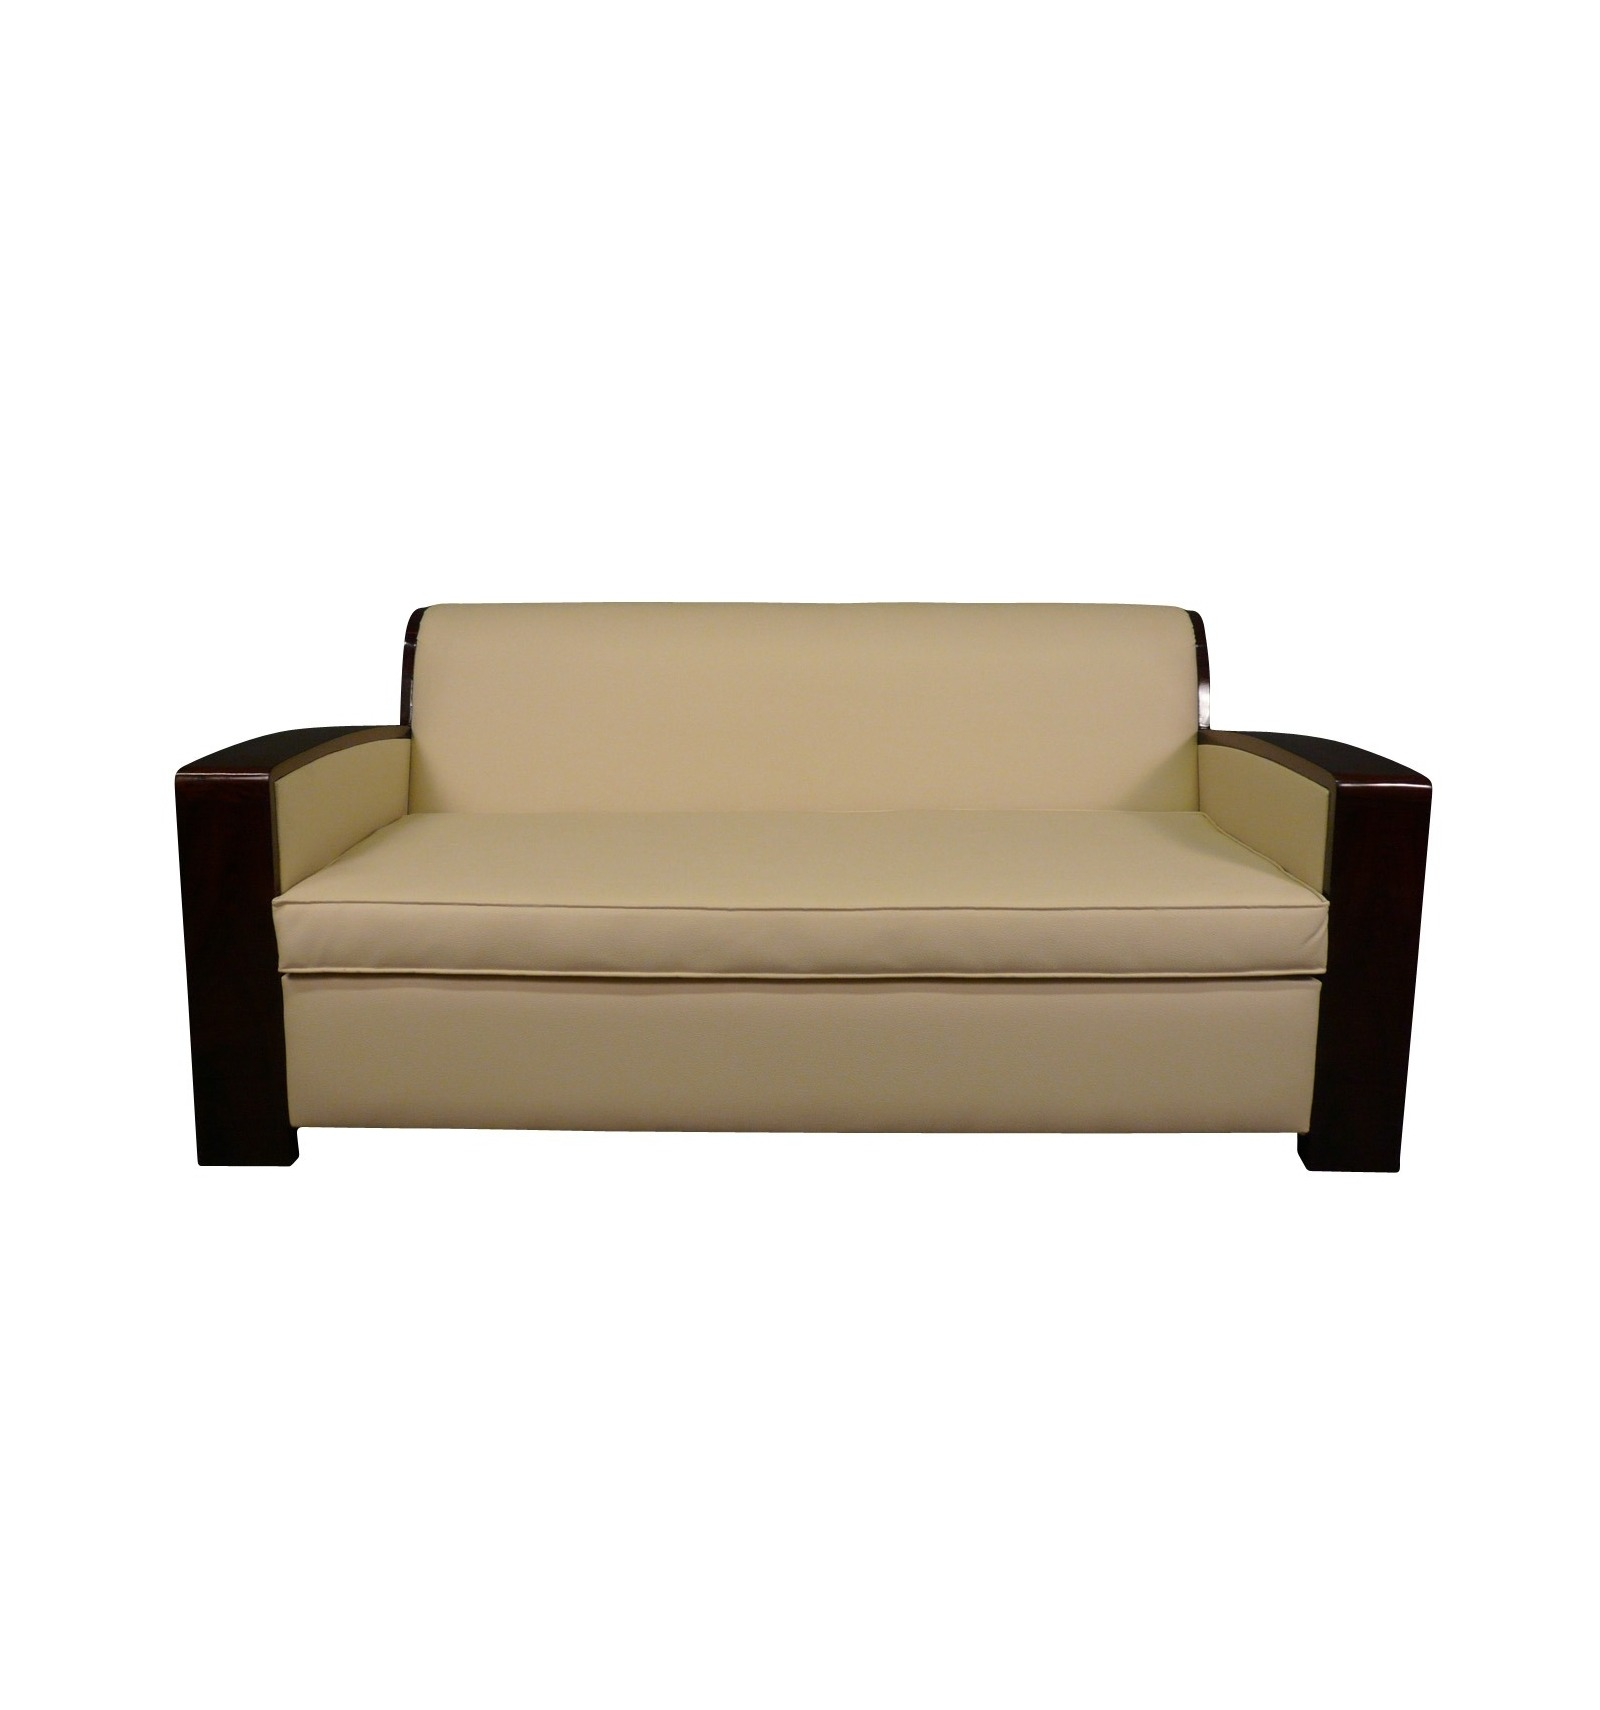 Pleasant Paris Art Deco Sofa Art Deco Mobel Evergreenethics Interior Chair Design Evergreenethicsorg